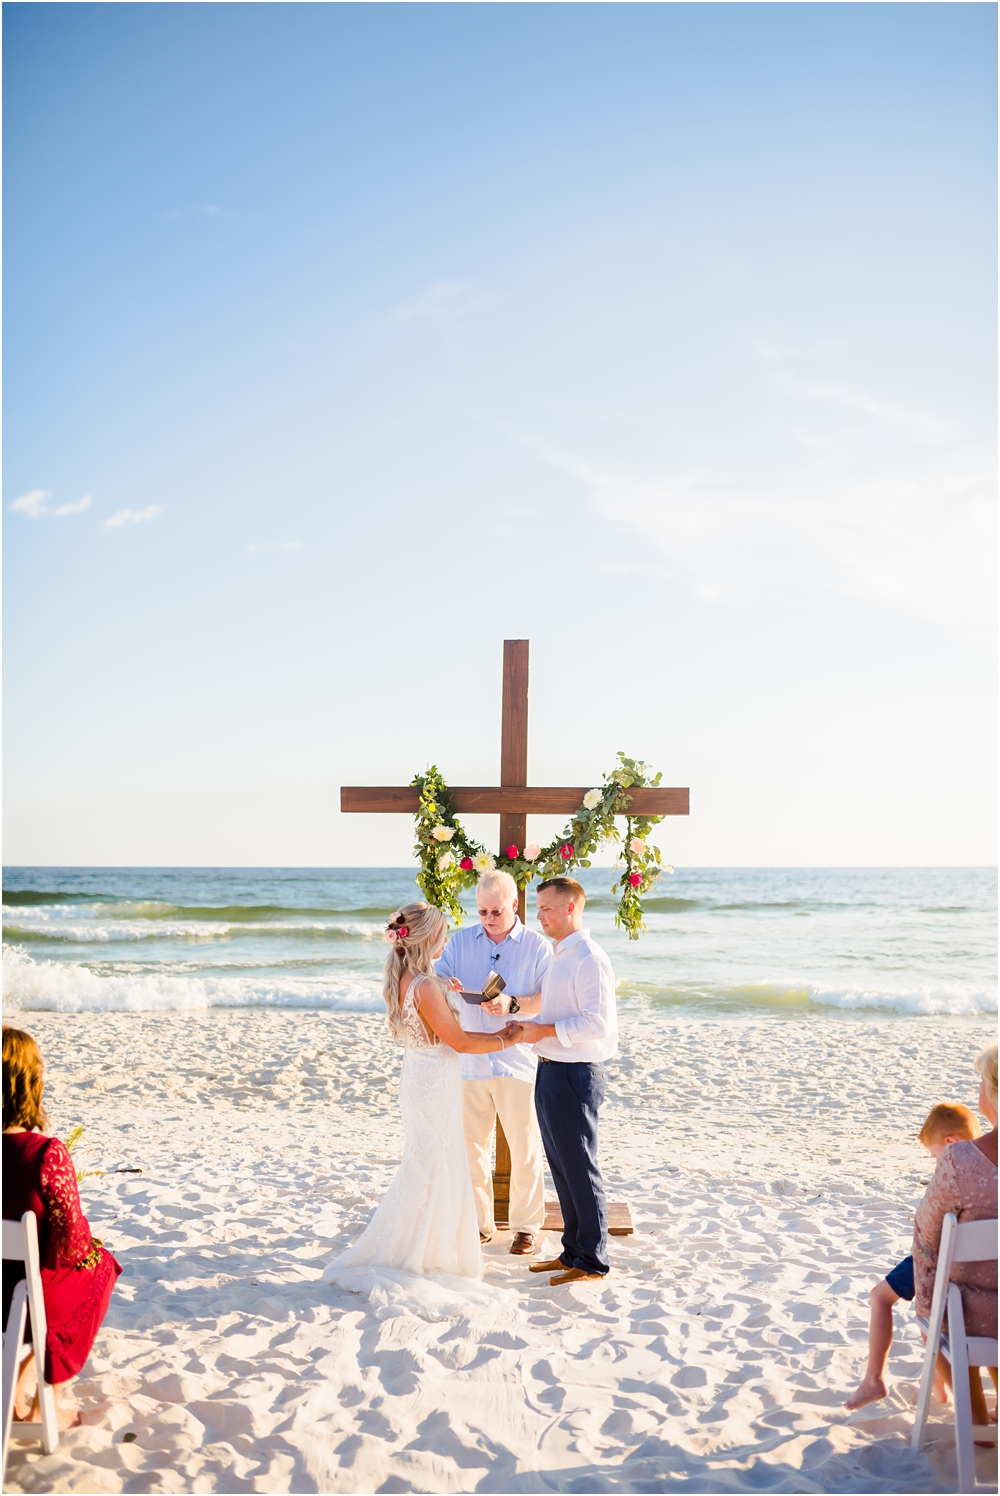 mcglothlin-wedding-kiersten-stevenson-photography-30a-panama-city-beach-dothan-tallahassee-(83-of-145).jpg